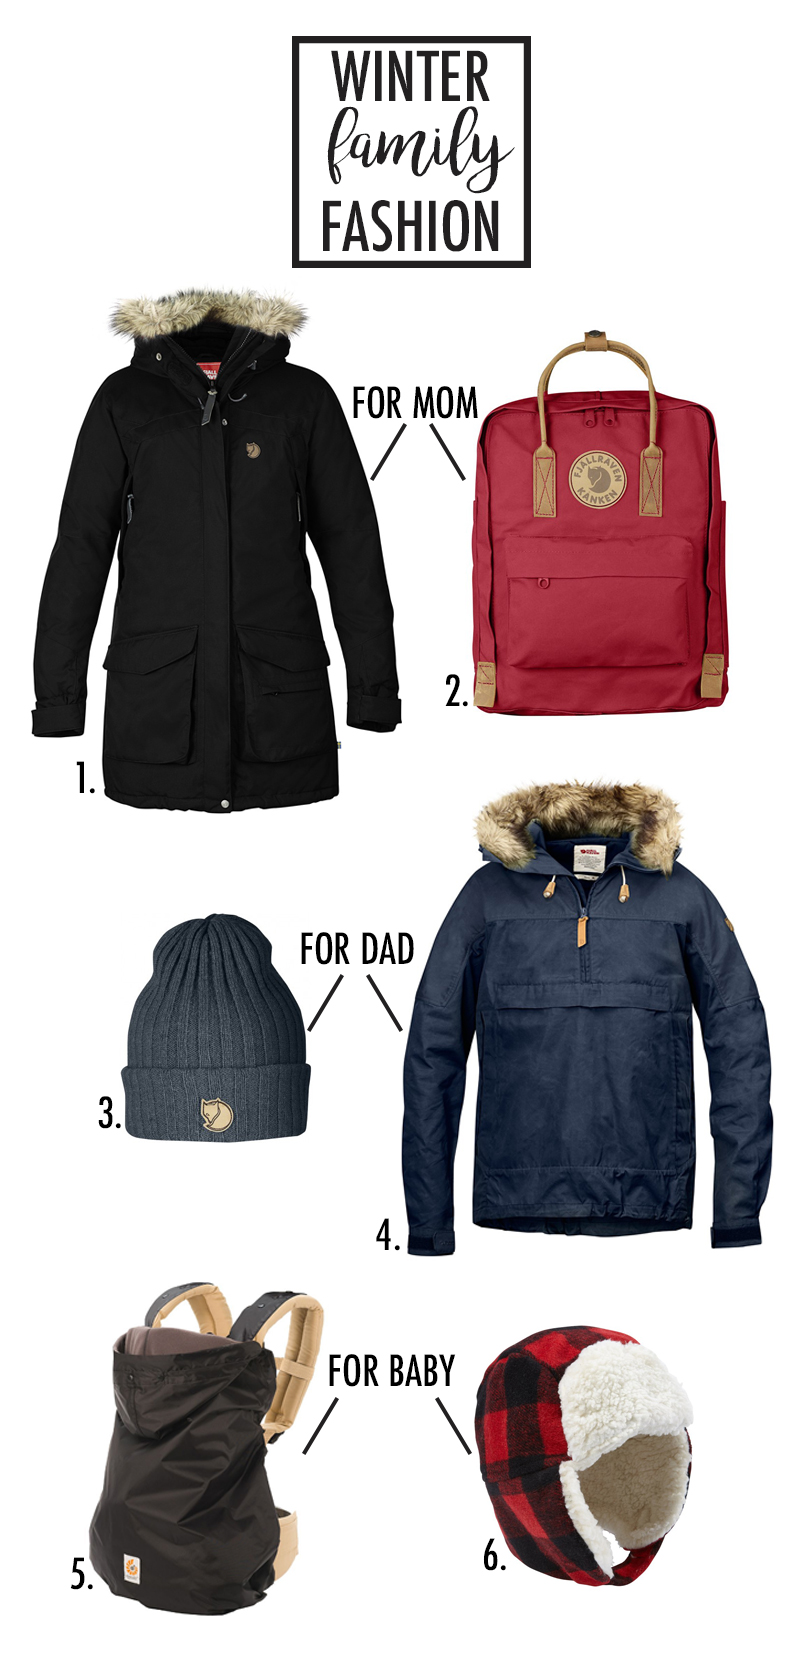 Winter fashion feat. Fjallraven